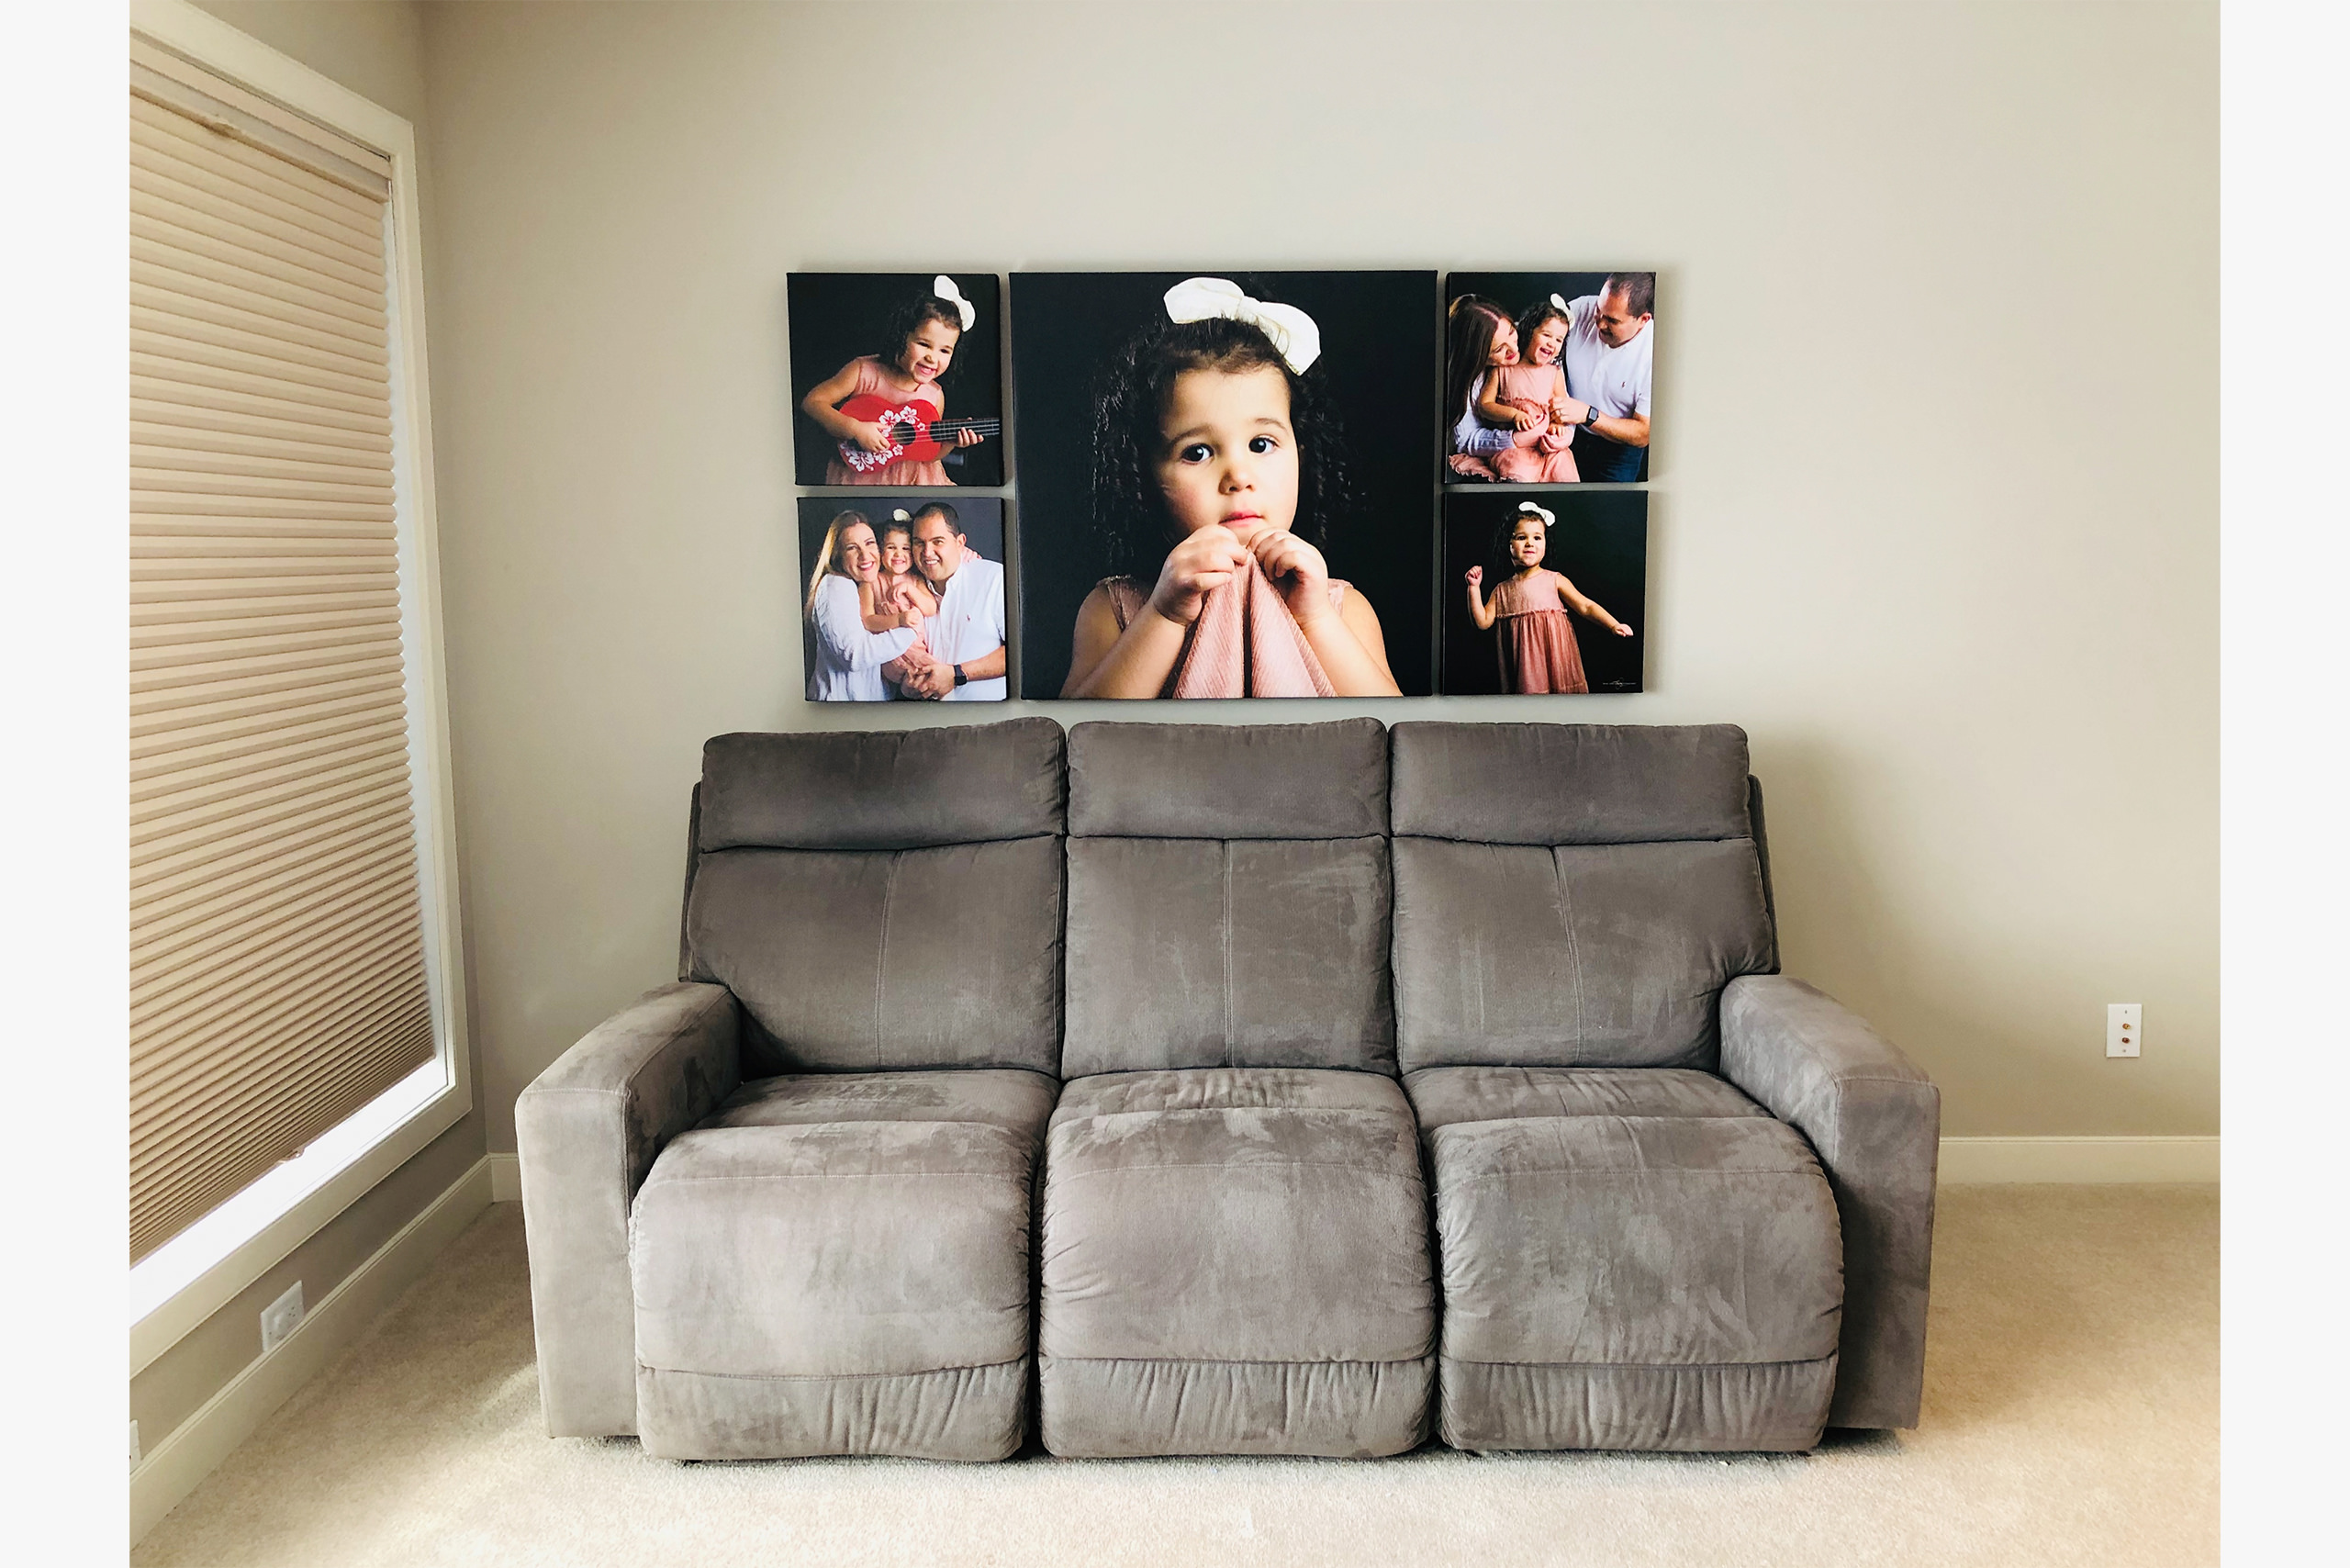 Sean LeBlanc Photography Commissioned Wall Art